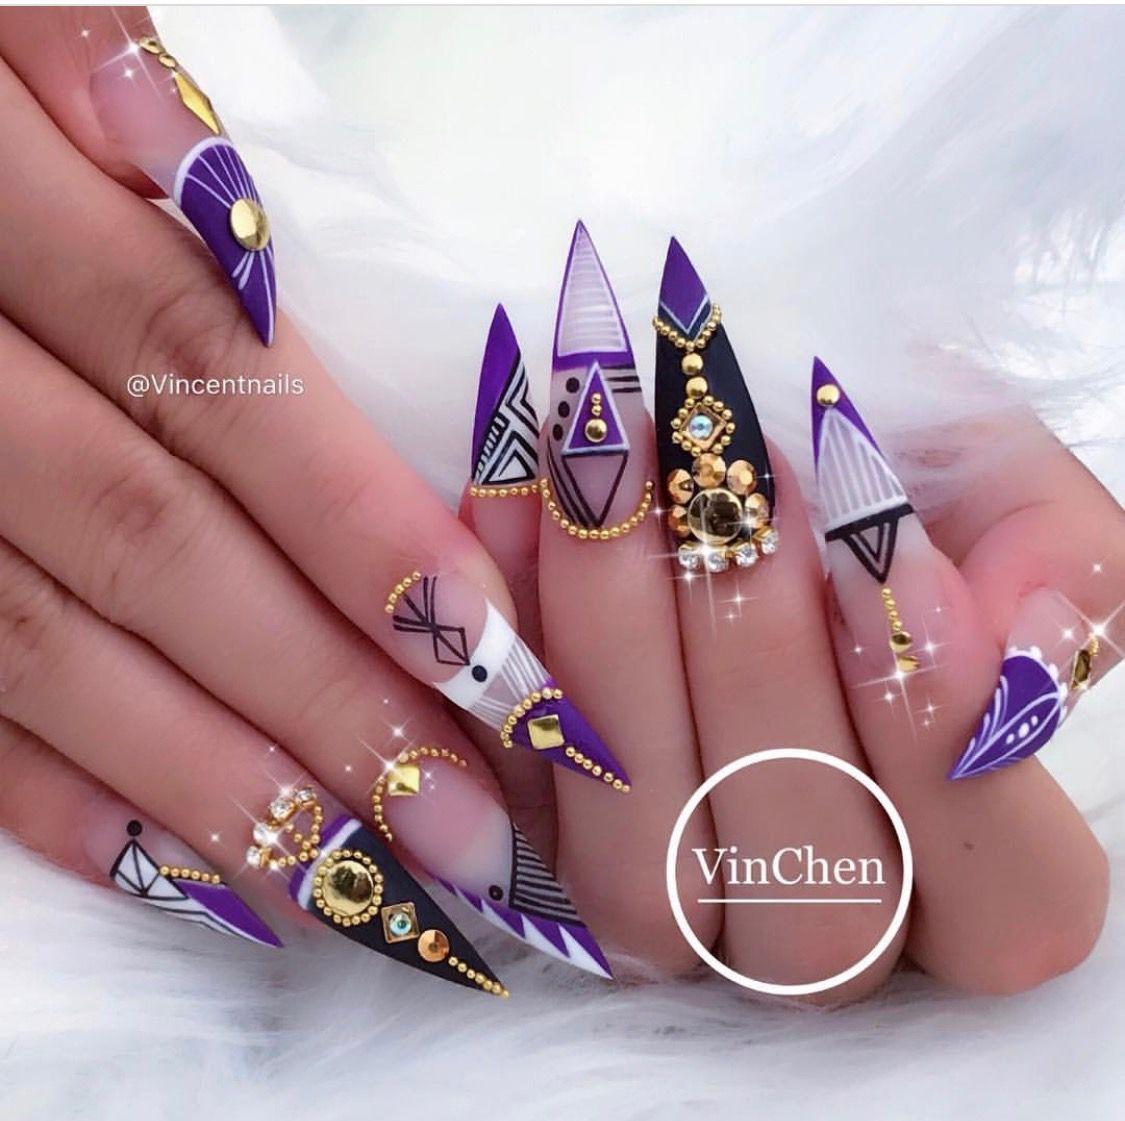 Abstract nail designs on stiletto / point nails. - Pin By Elena Aguiñaga On Claws Pinterest Nail Nail, Makeup And Pedi